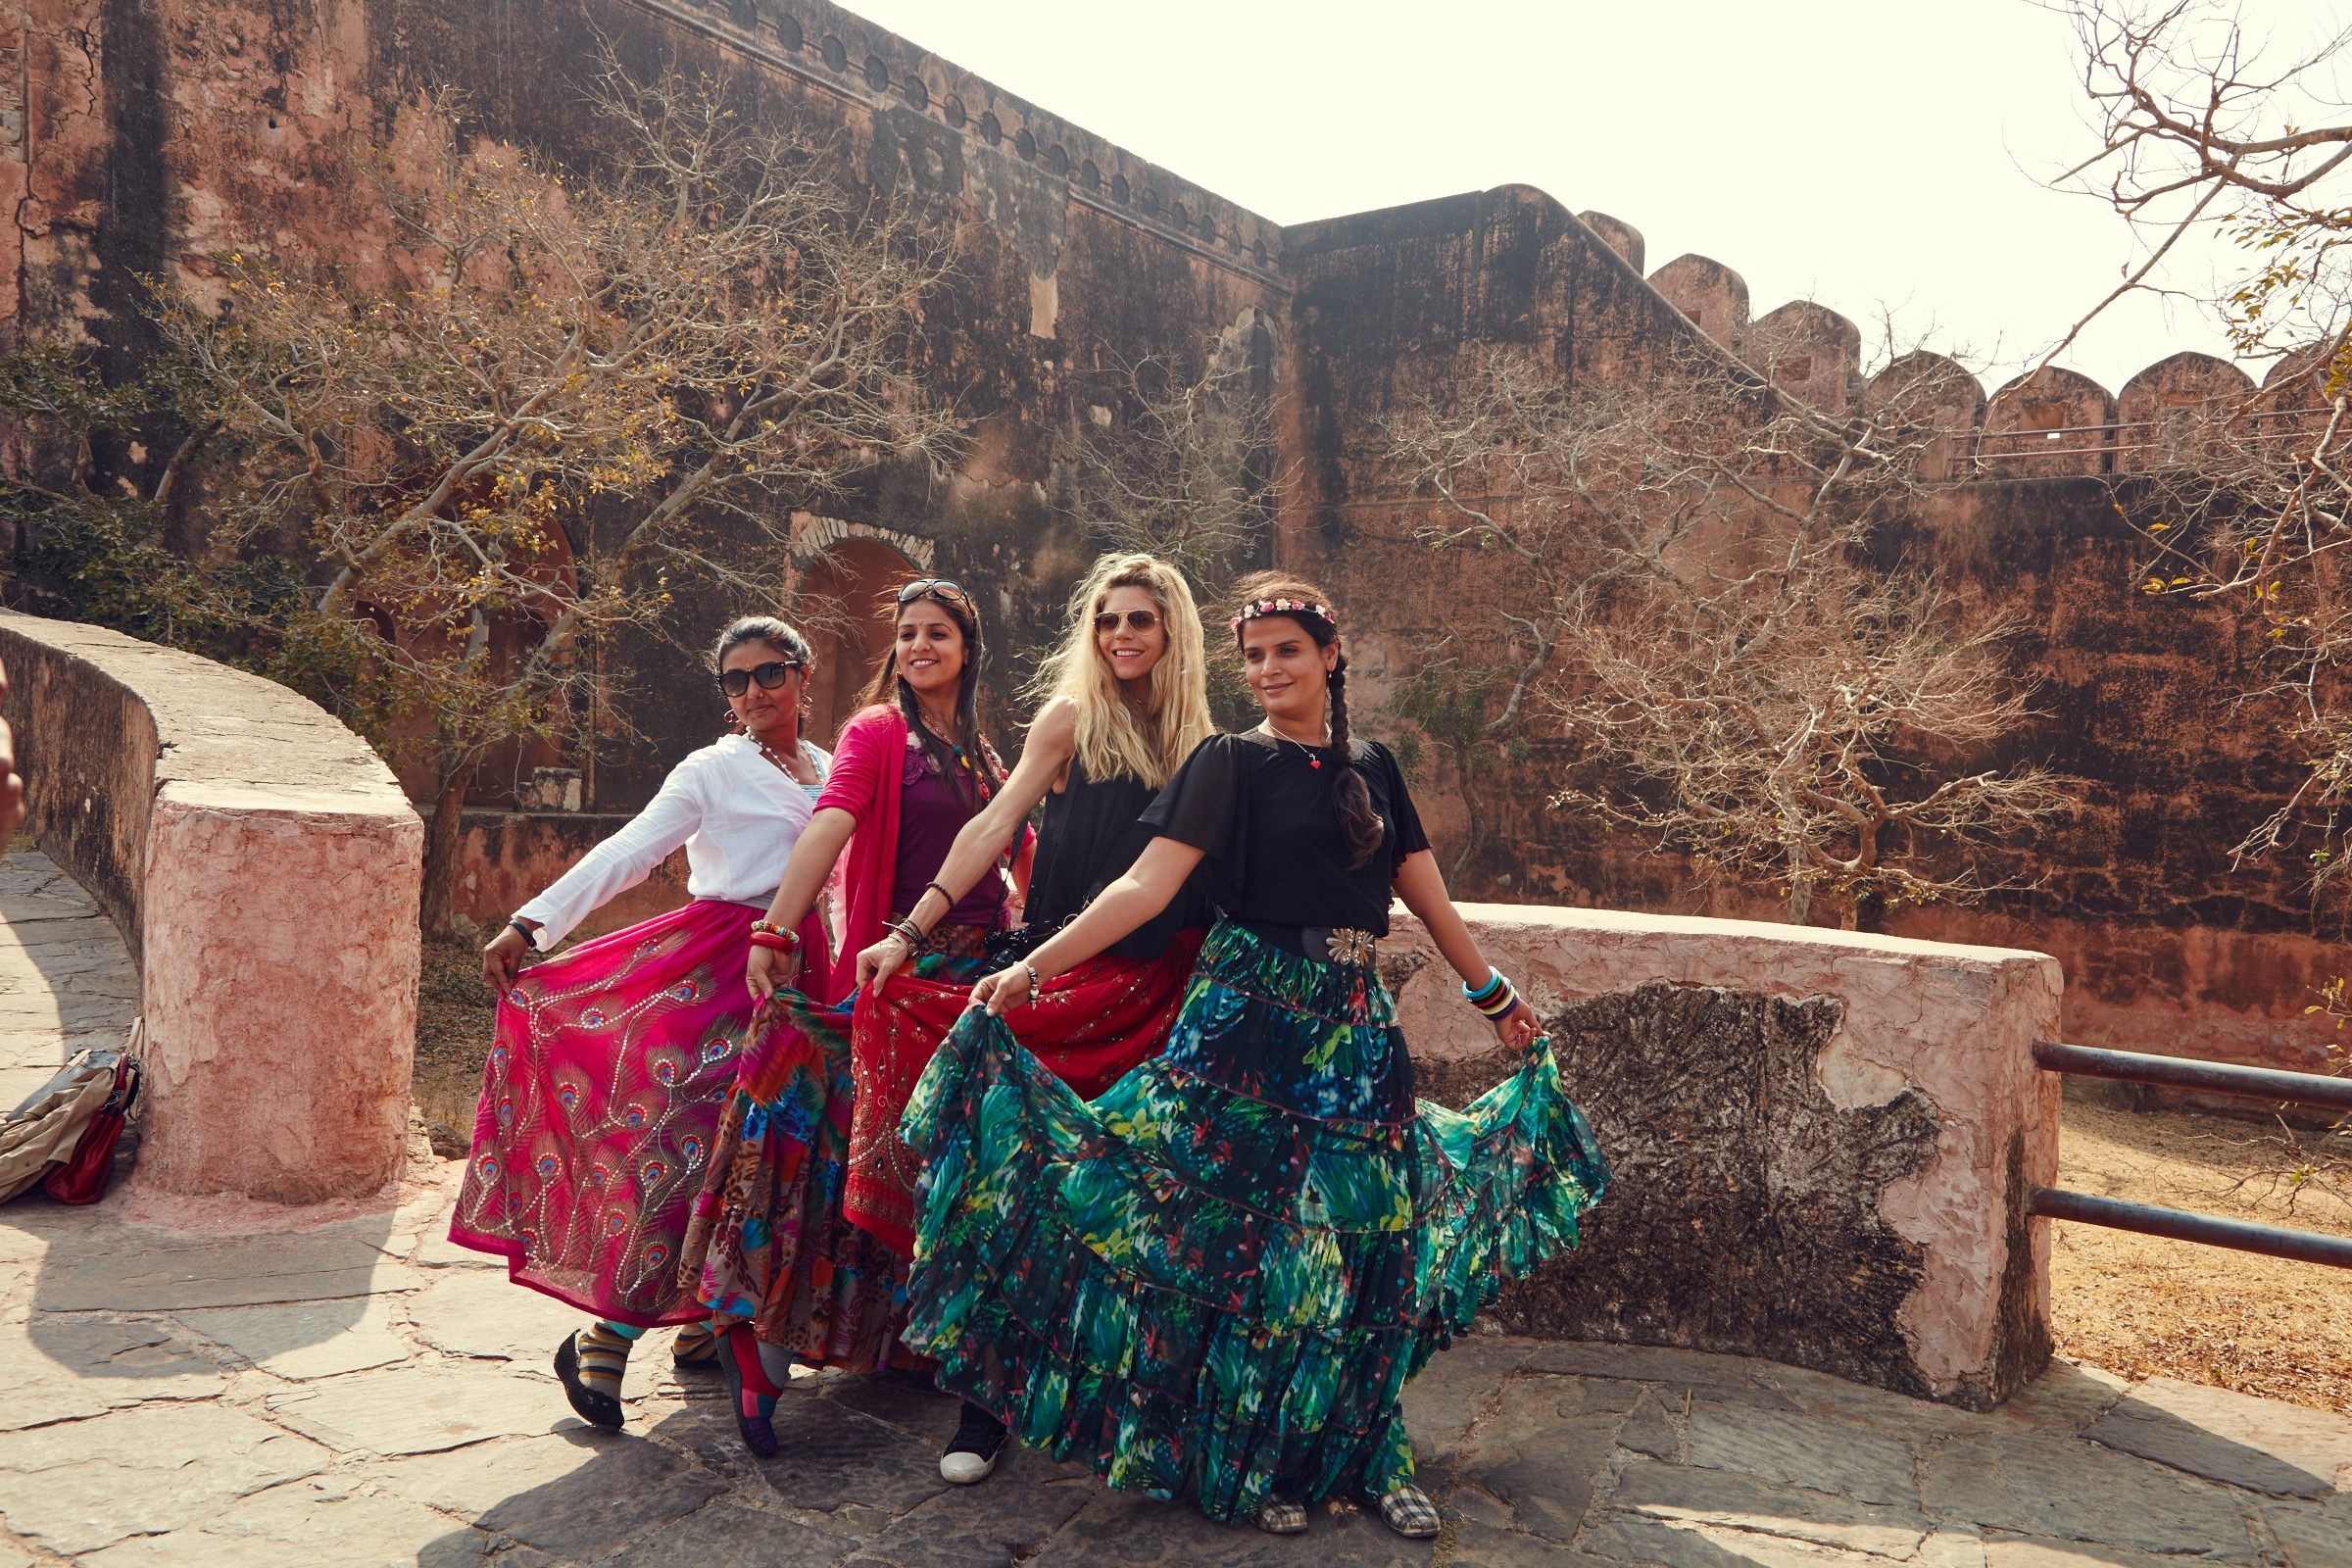 Photo by Erik Almas in Jaipur, INDIA